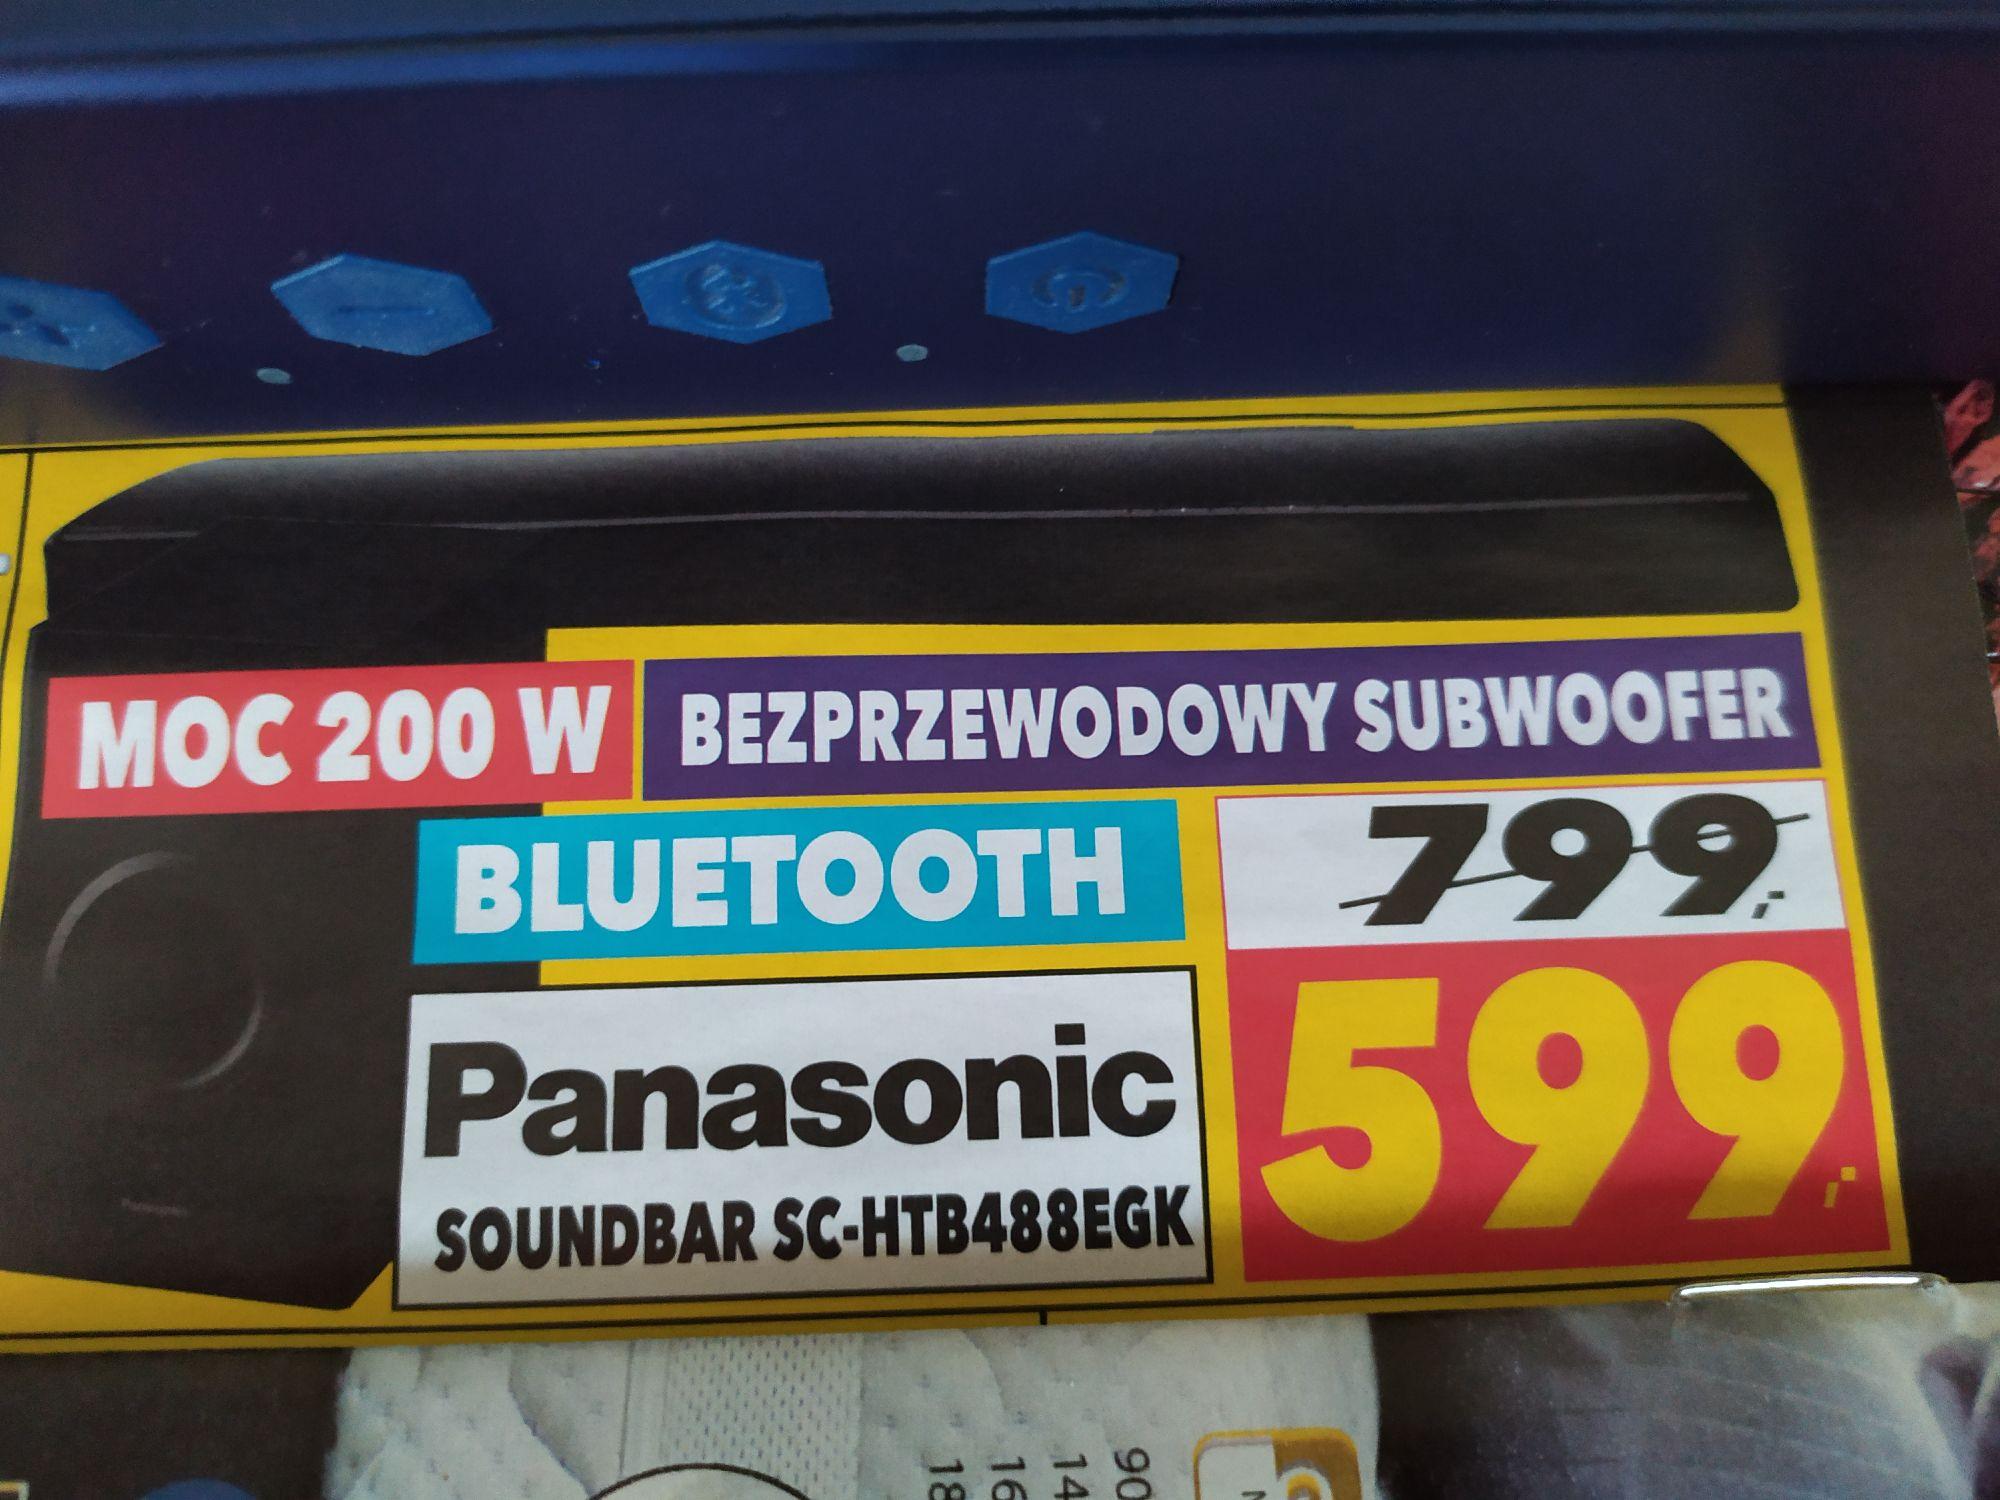 Soundbar Panasonic SC-HTB488EGK ; Karta pamięci MicroSD Toshiba - RTV EURO AGD